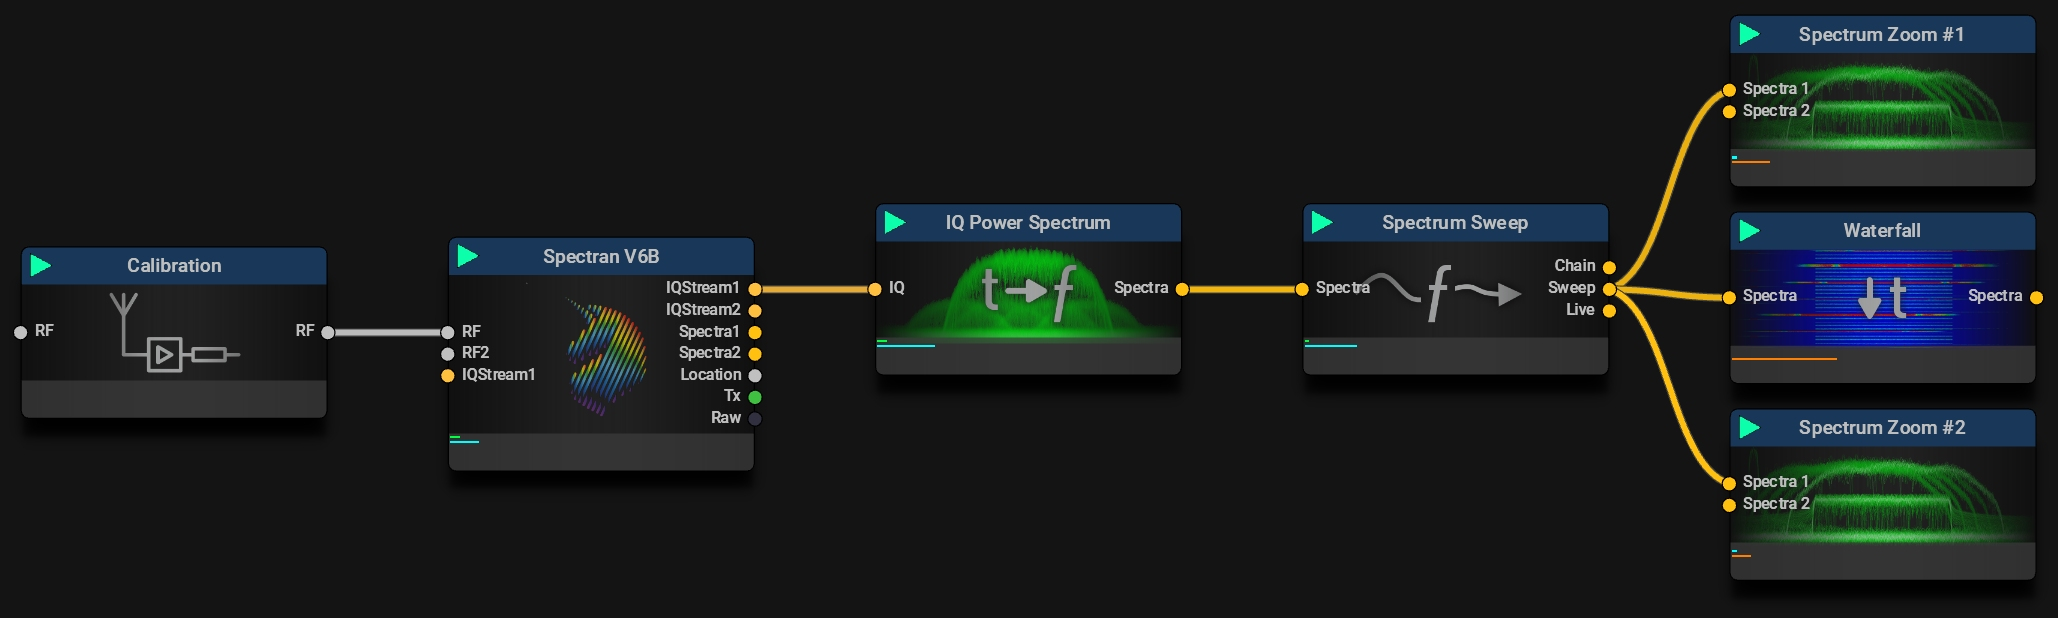 Spectrum Sweep Zoom Mission Setup